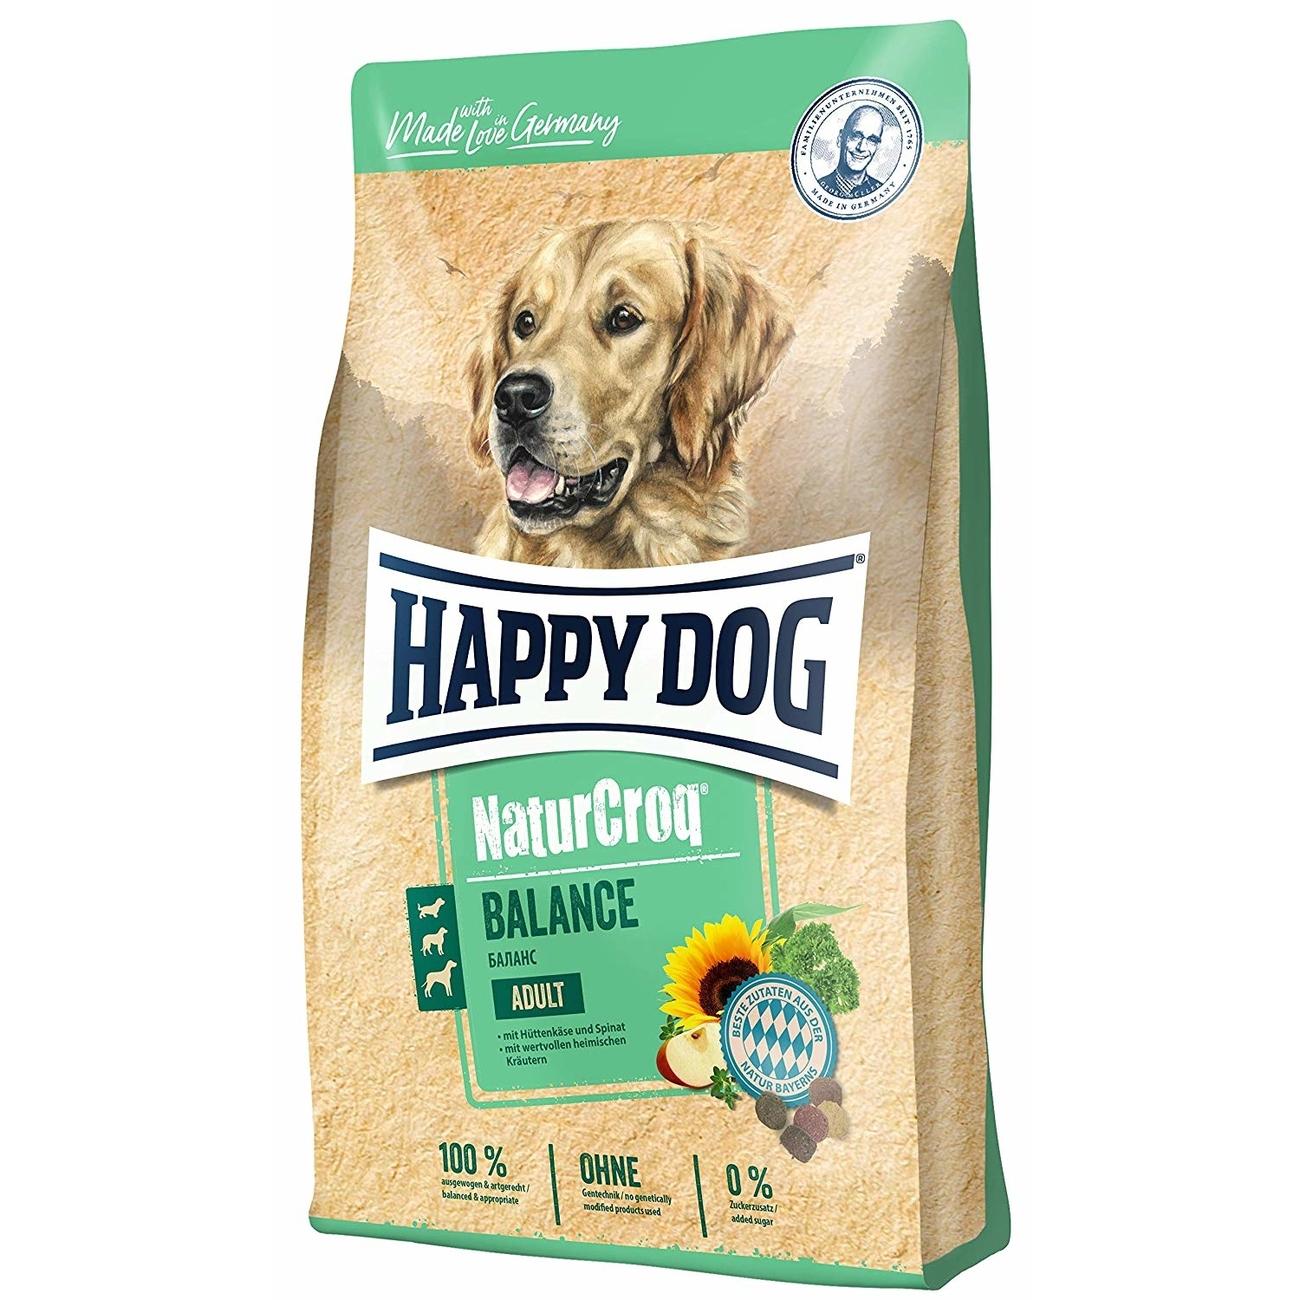 Happy Dog Naturcroq Balance